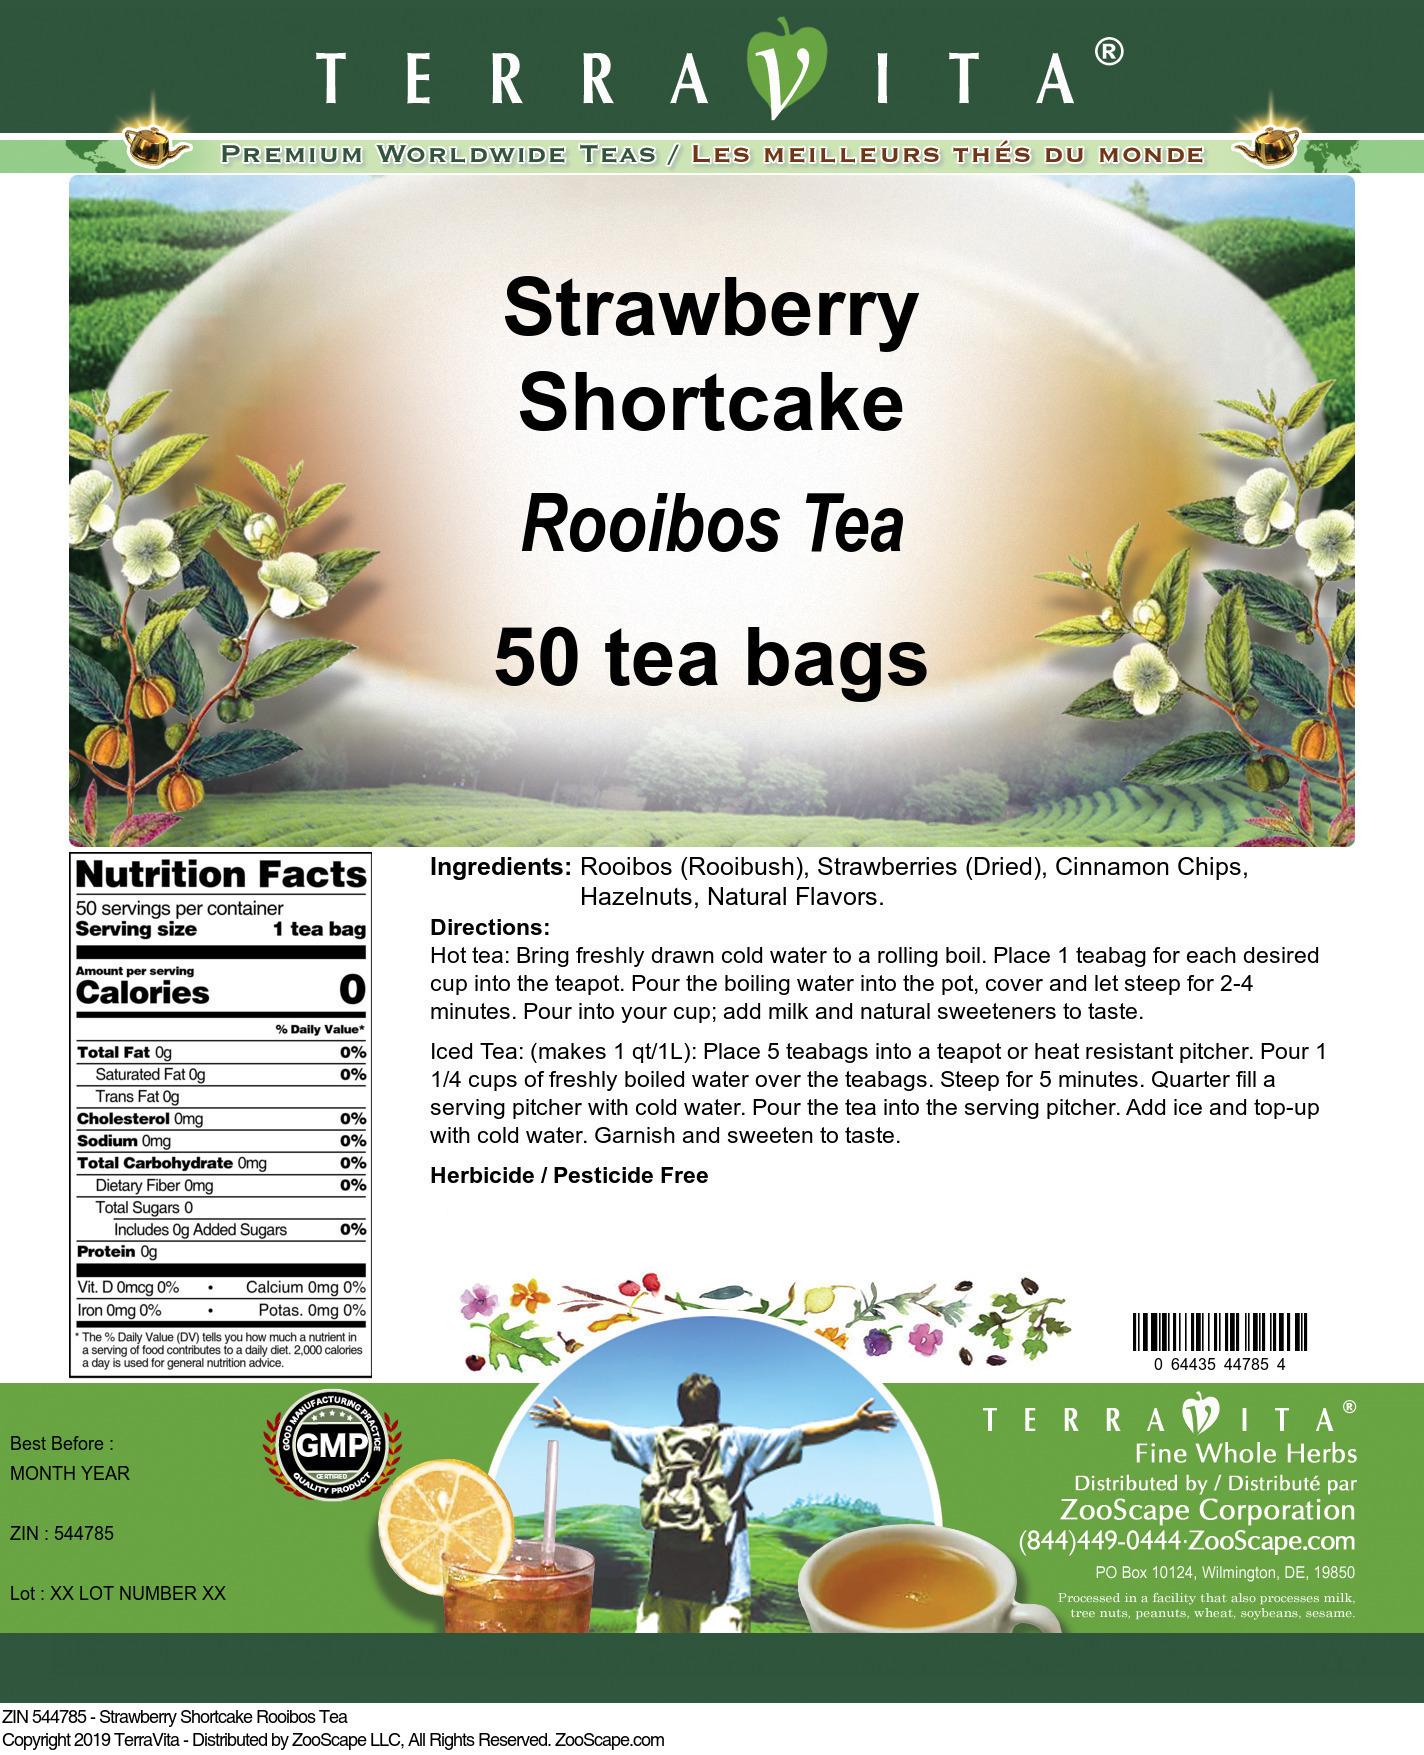 Strawberry Shortcake Rooibos Tea